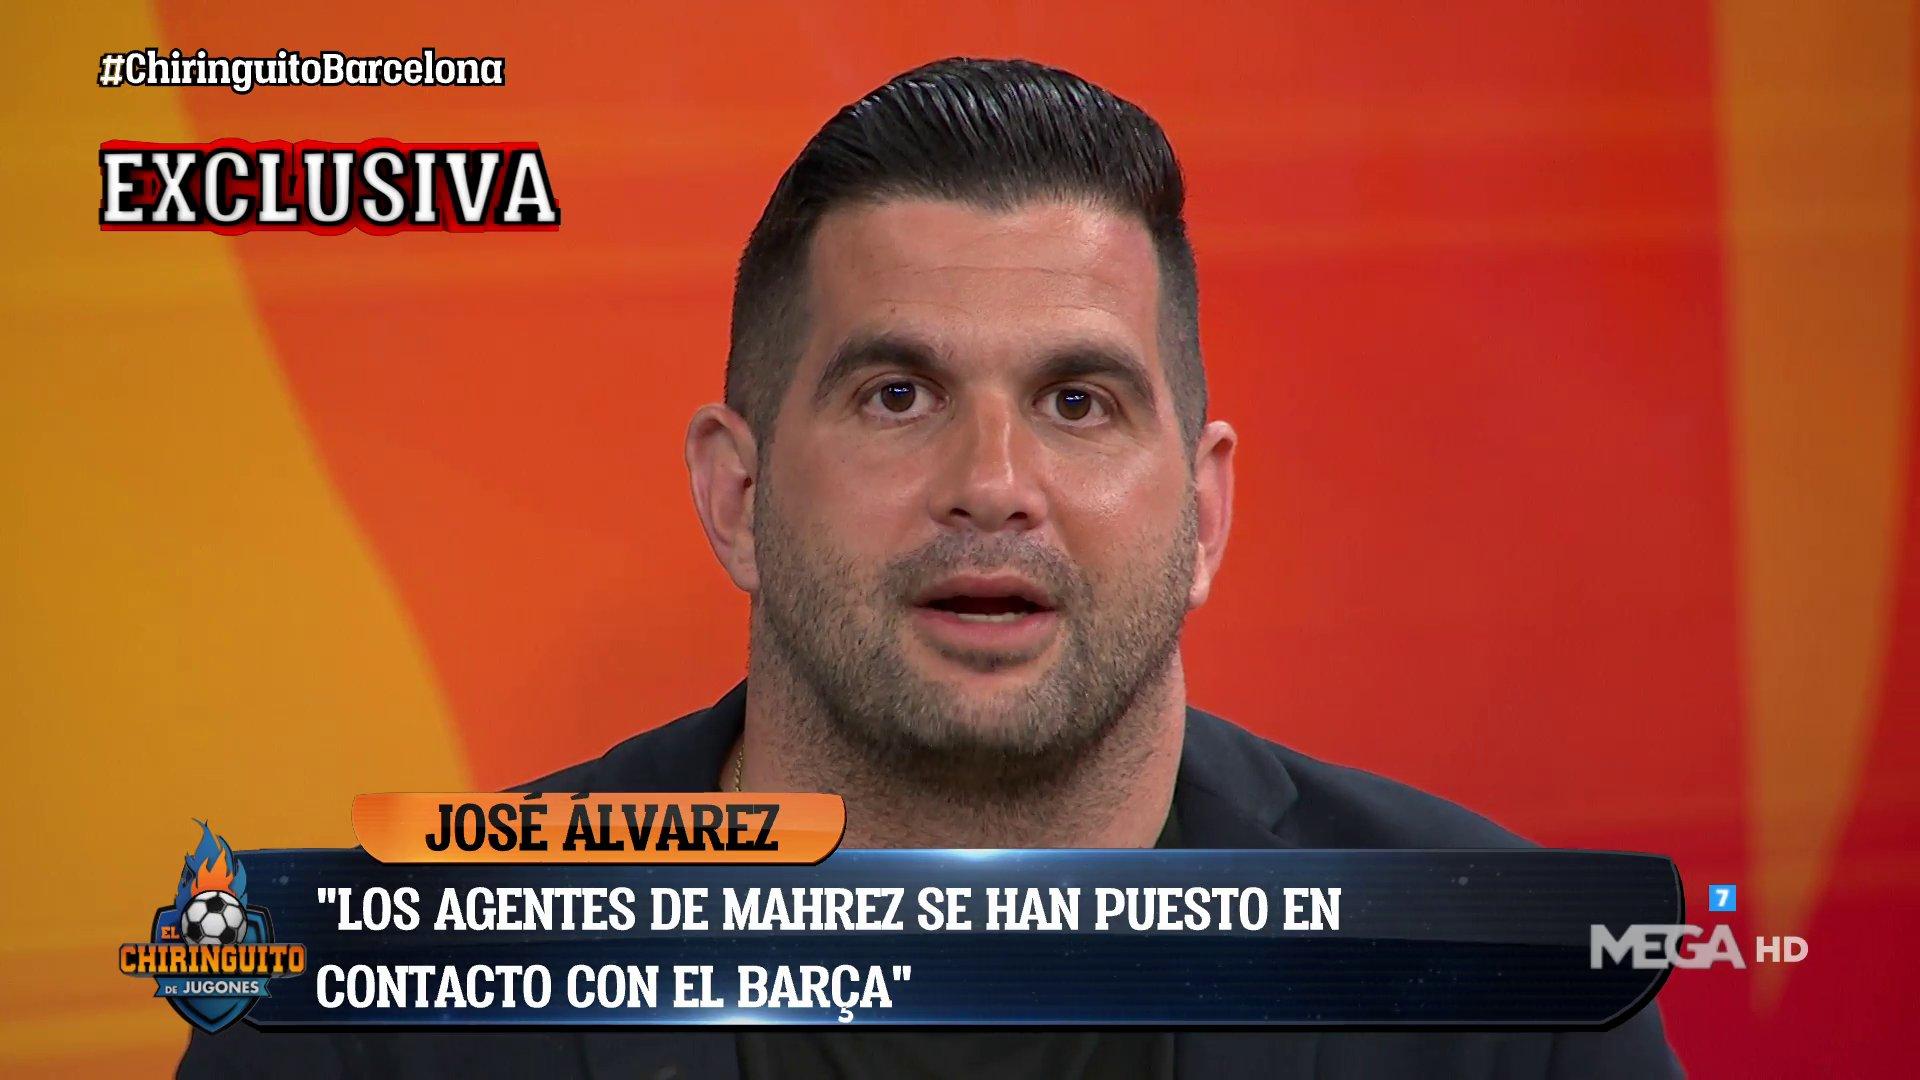 Álvarez - La cabeza de José Álvarez (El Chiringuito) E3Ua--LXIAInGxN?format=jpg&name=large